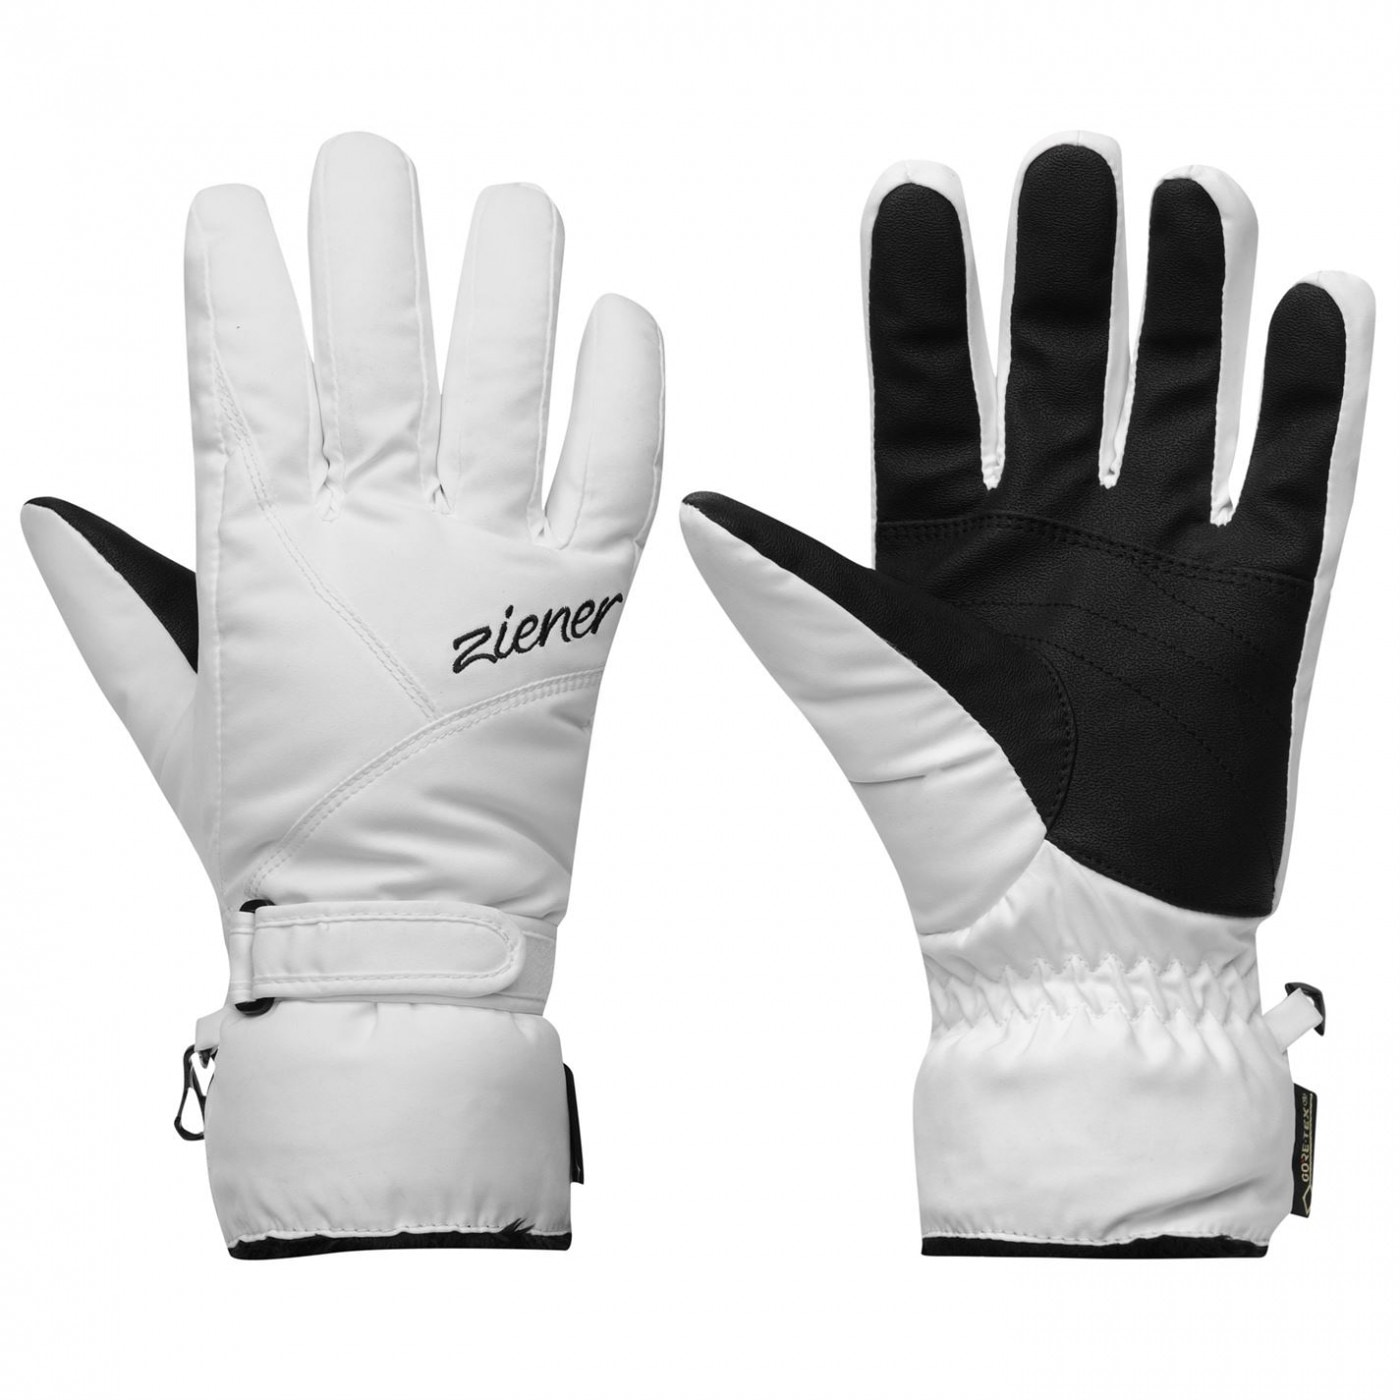 Ziener 1336 GTX Gloves Ladies